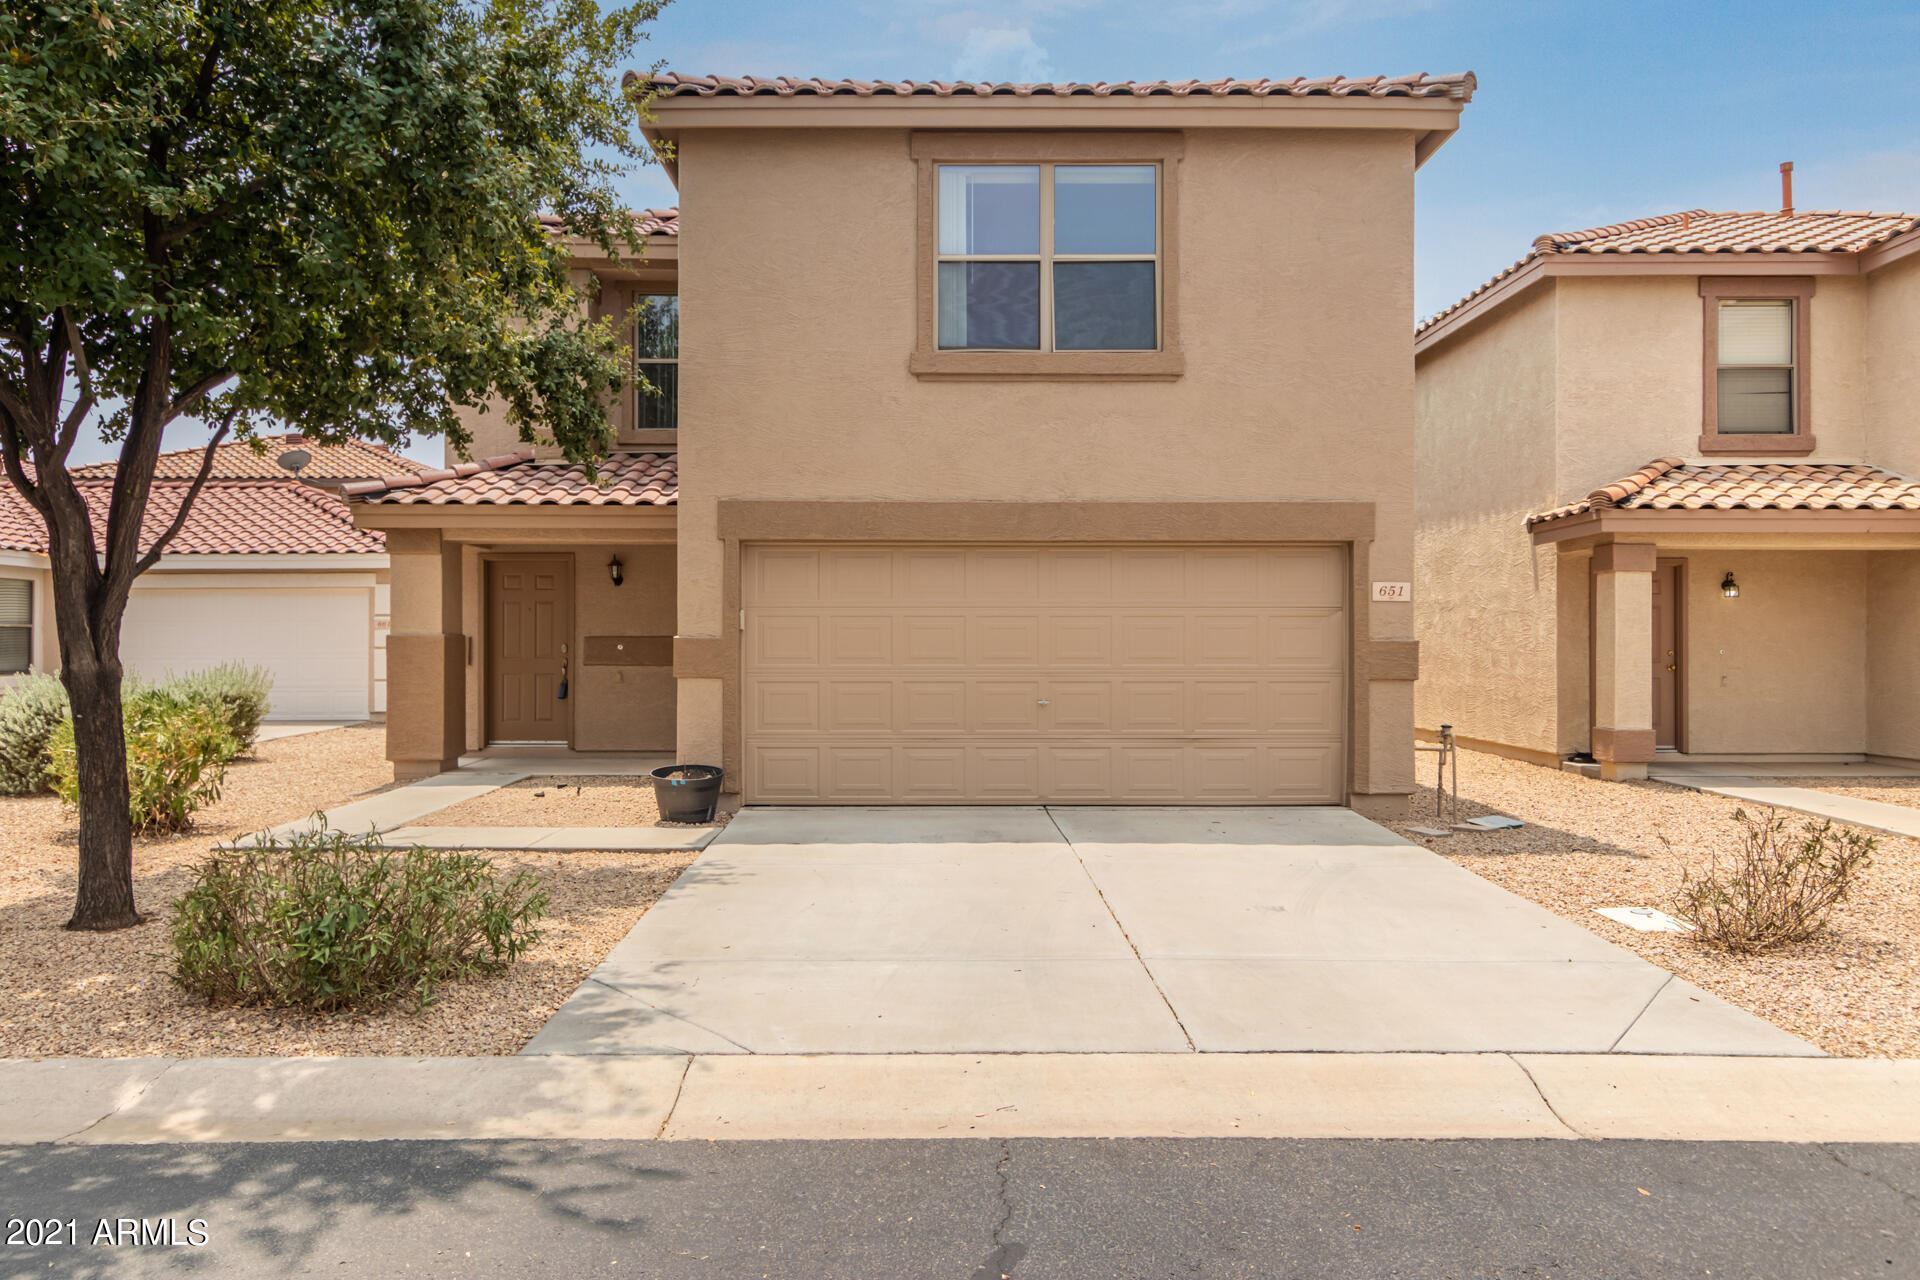 Photo of 651 E BANELLI Place, Chandler, AZ 85286 (MLS # 6269041)